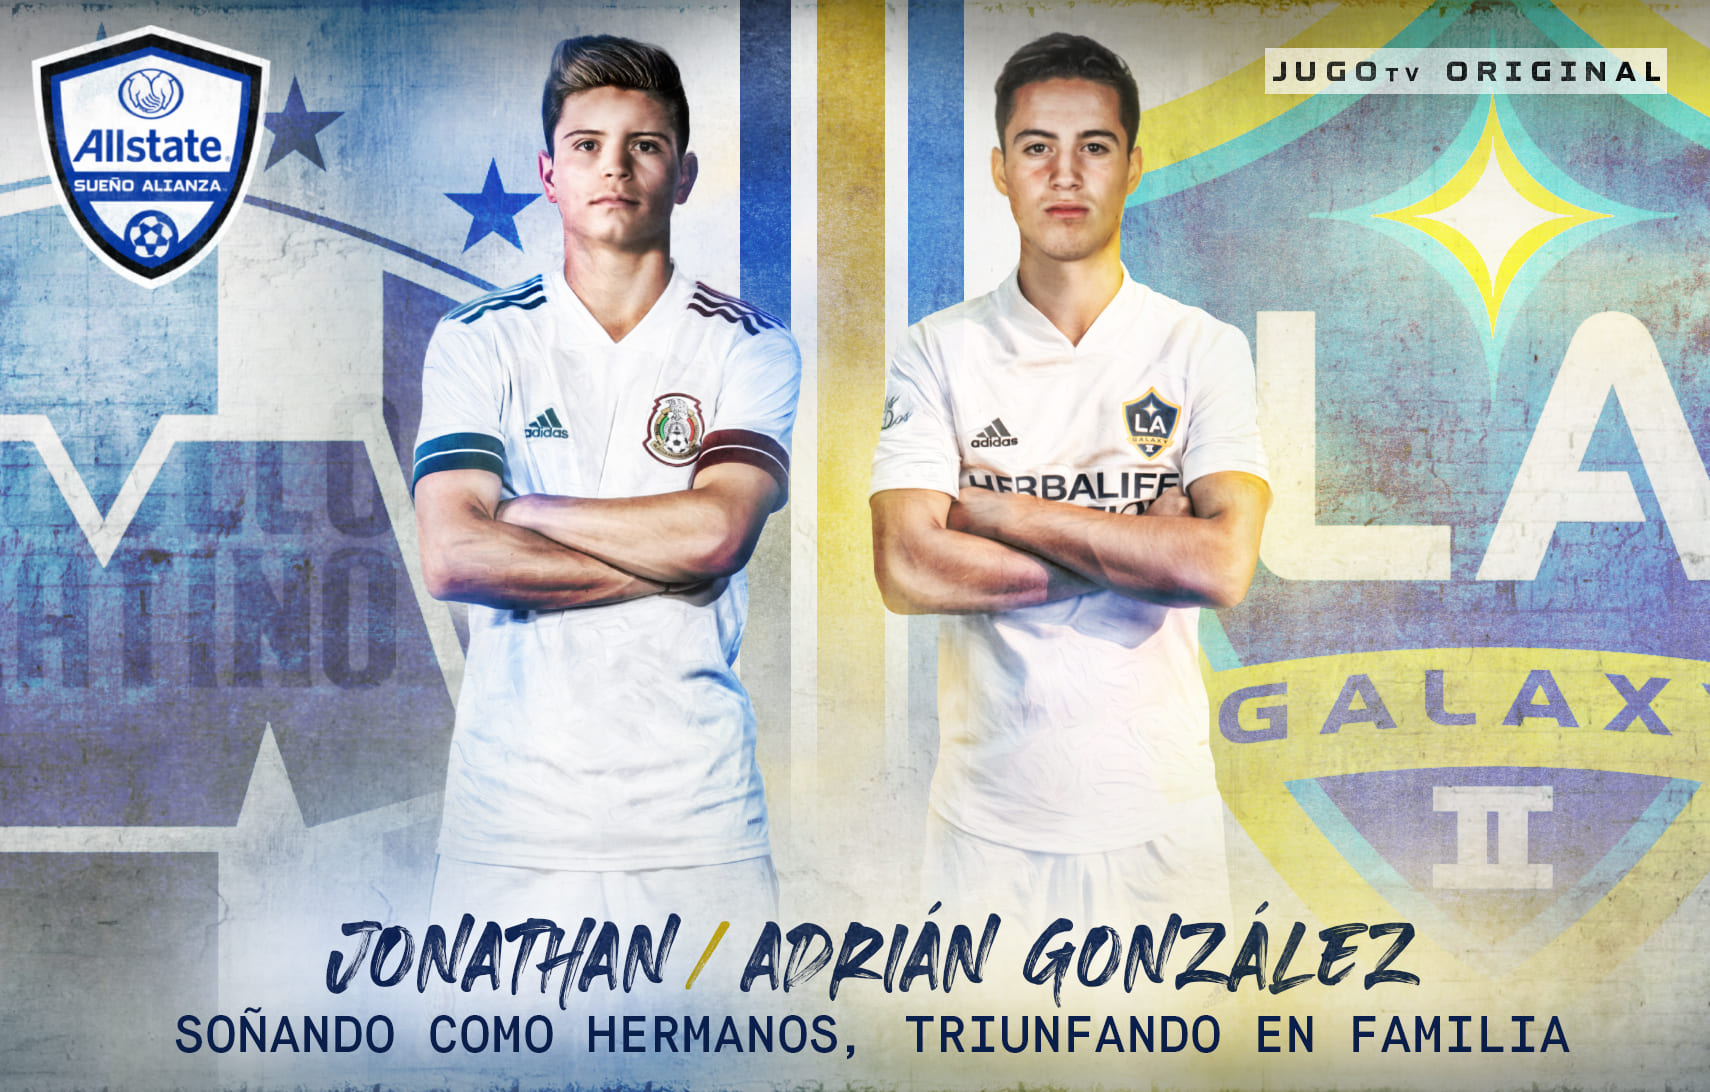 Jonathan y Adrián González son un orgullo latino